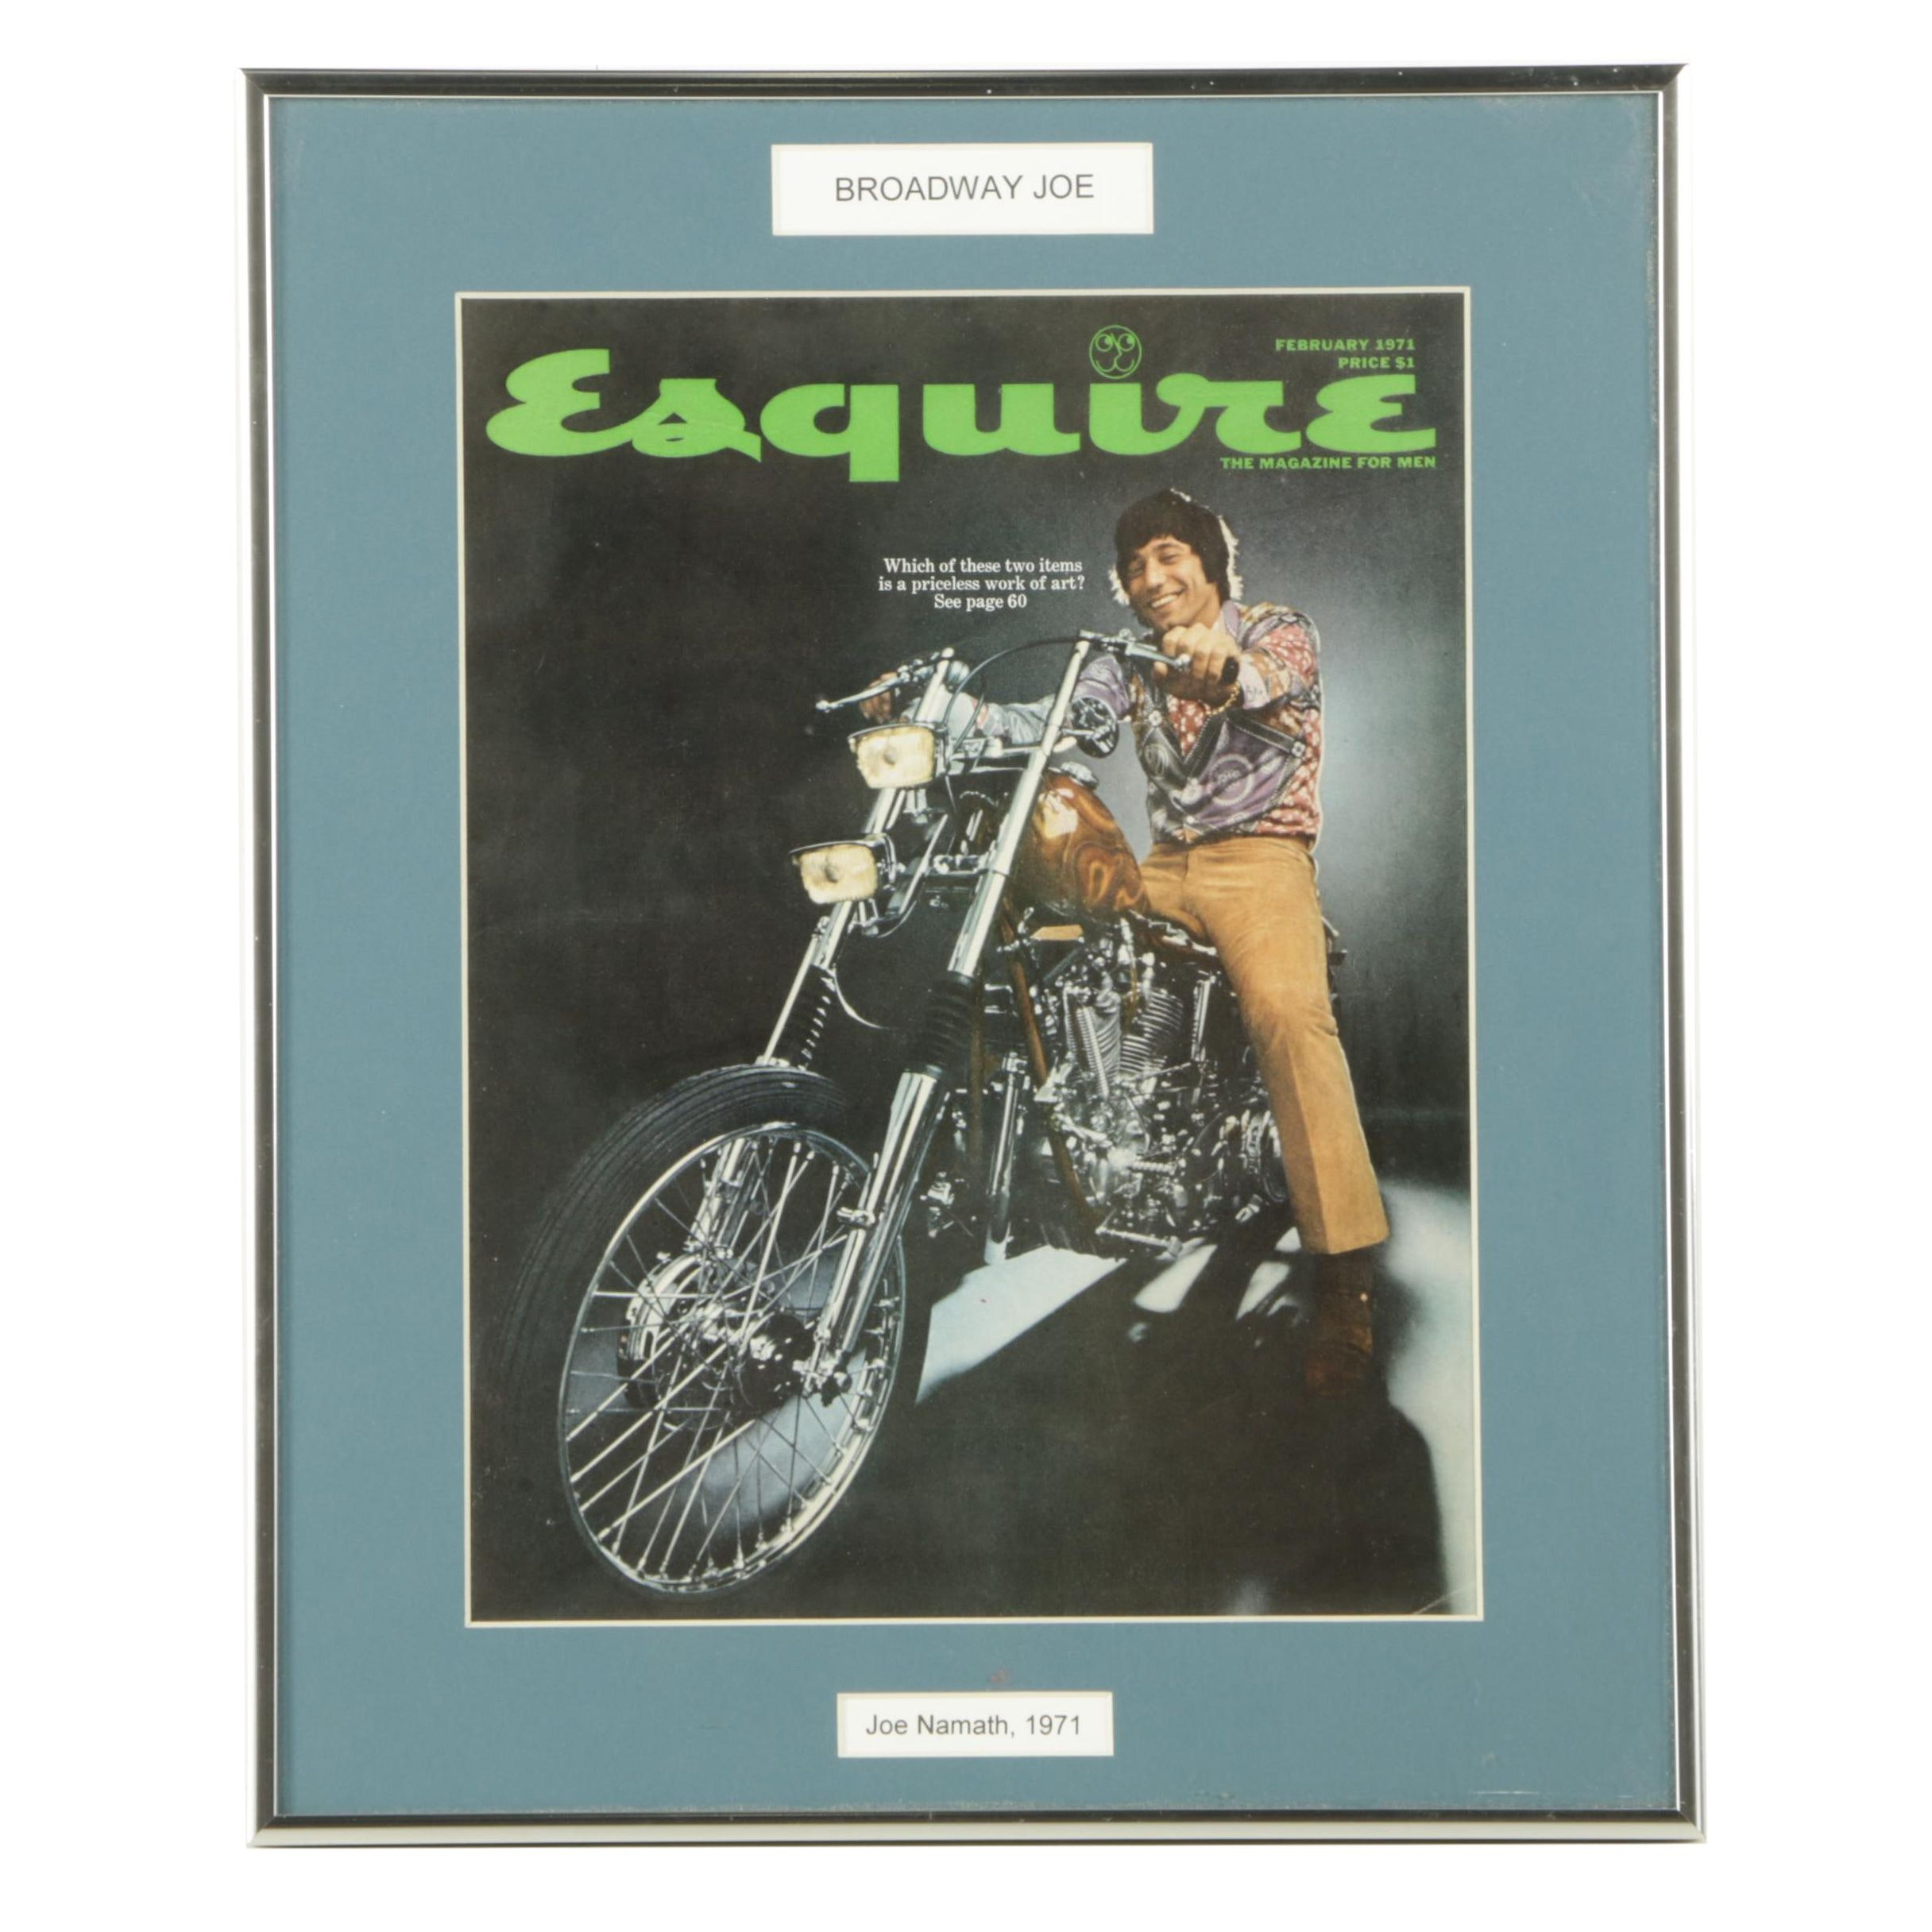 February 1971 Edition of Esquire Magazine